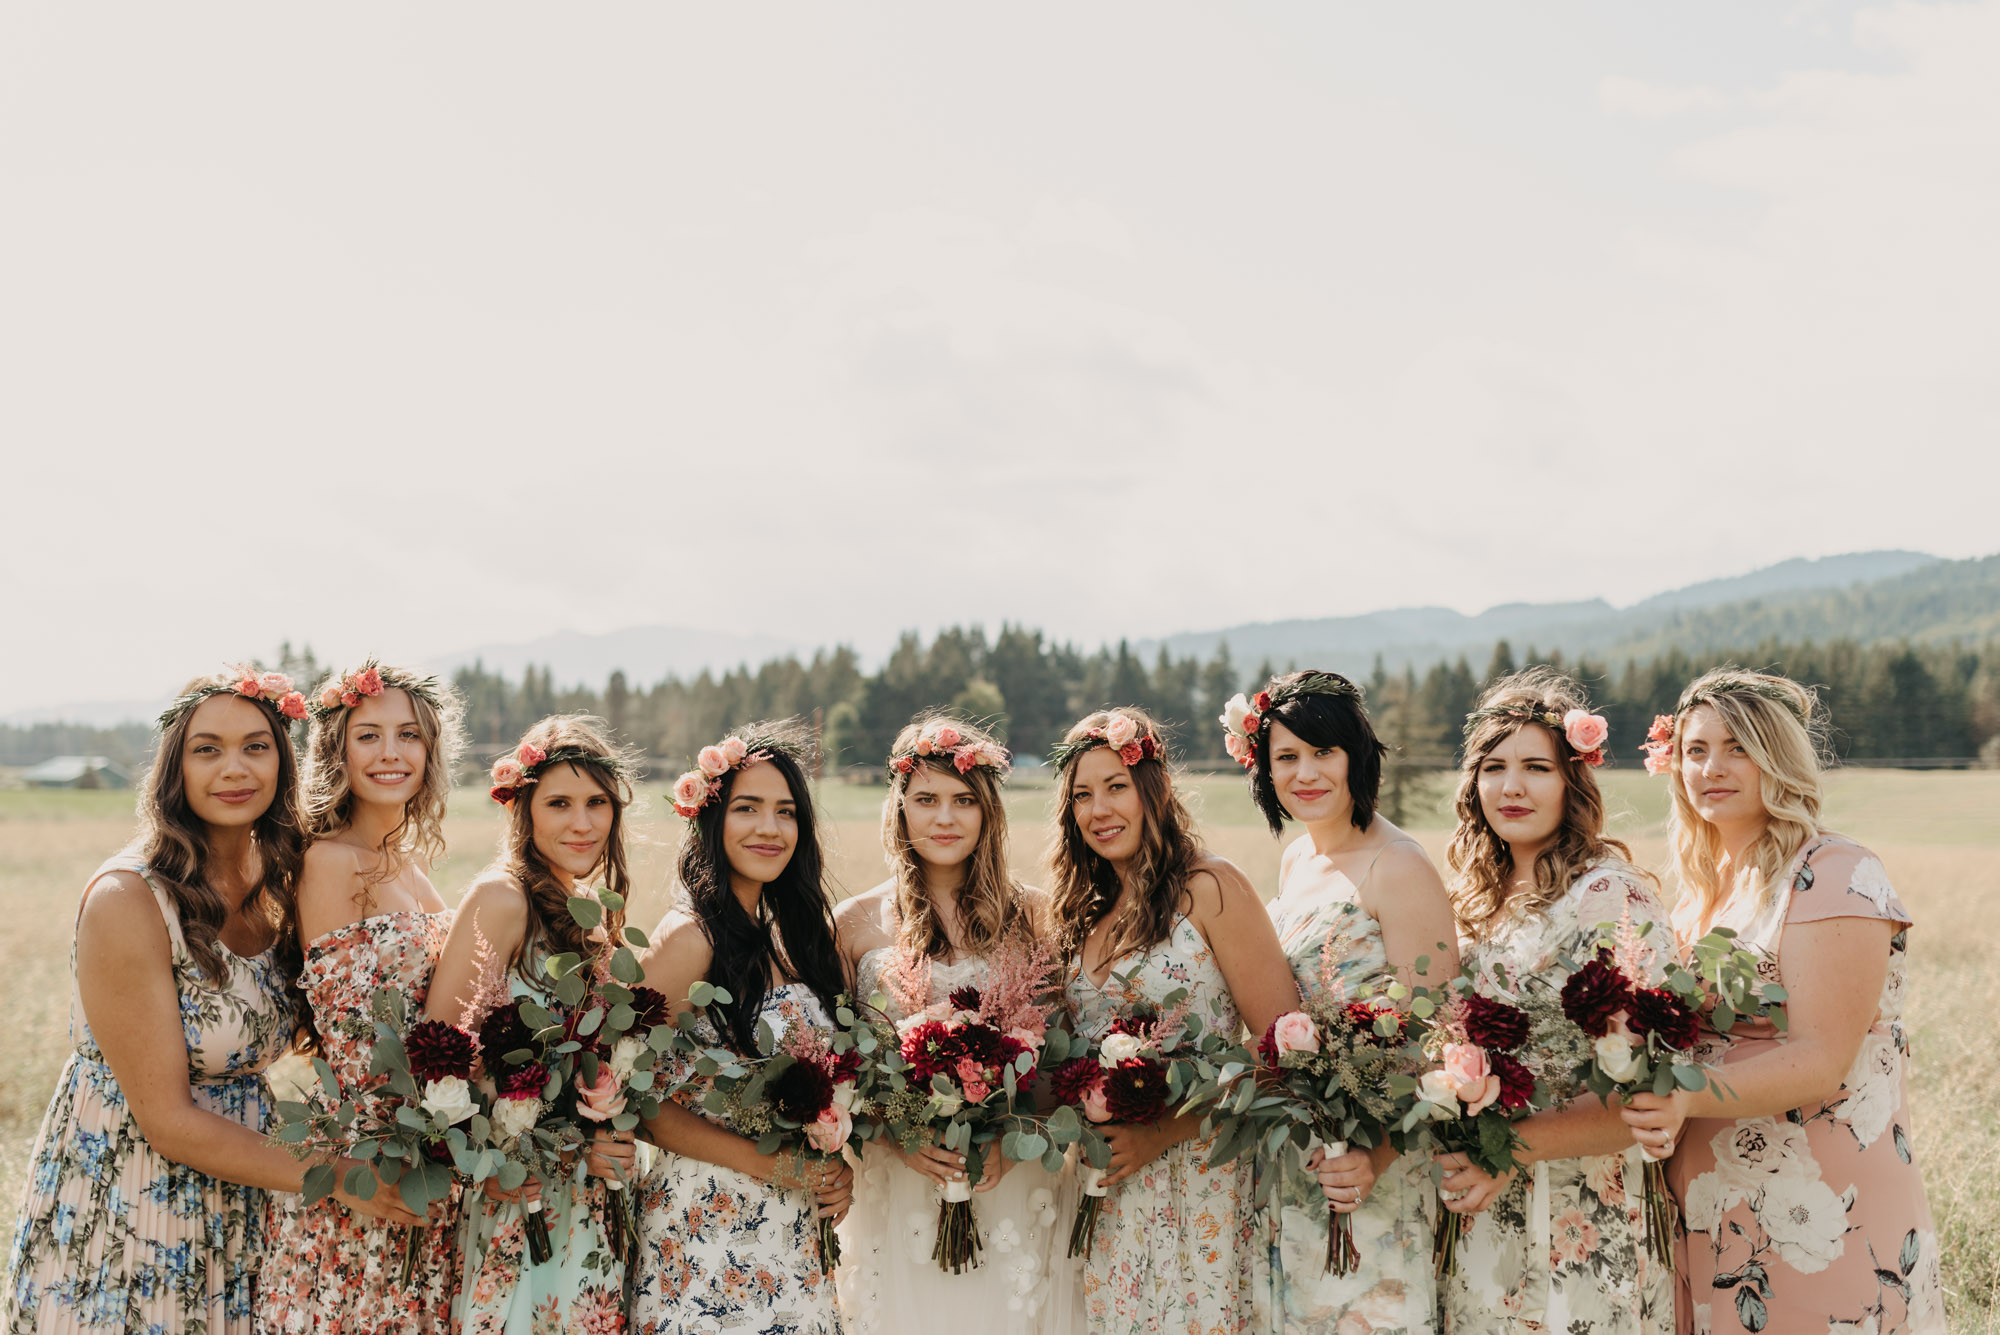 Bridal-Party-Free-People-Flower-Dresses-Washington-Wedding-8493.jpg